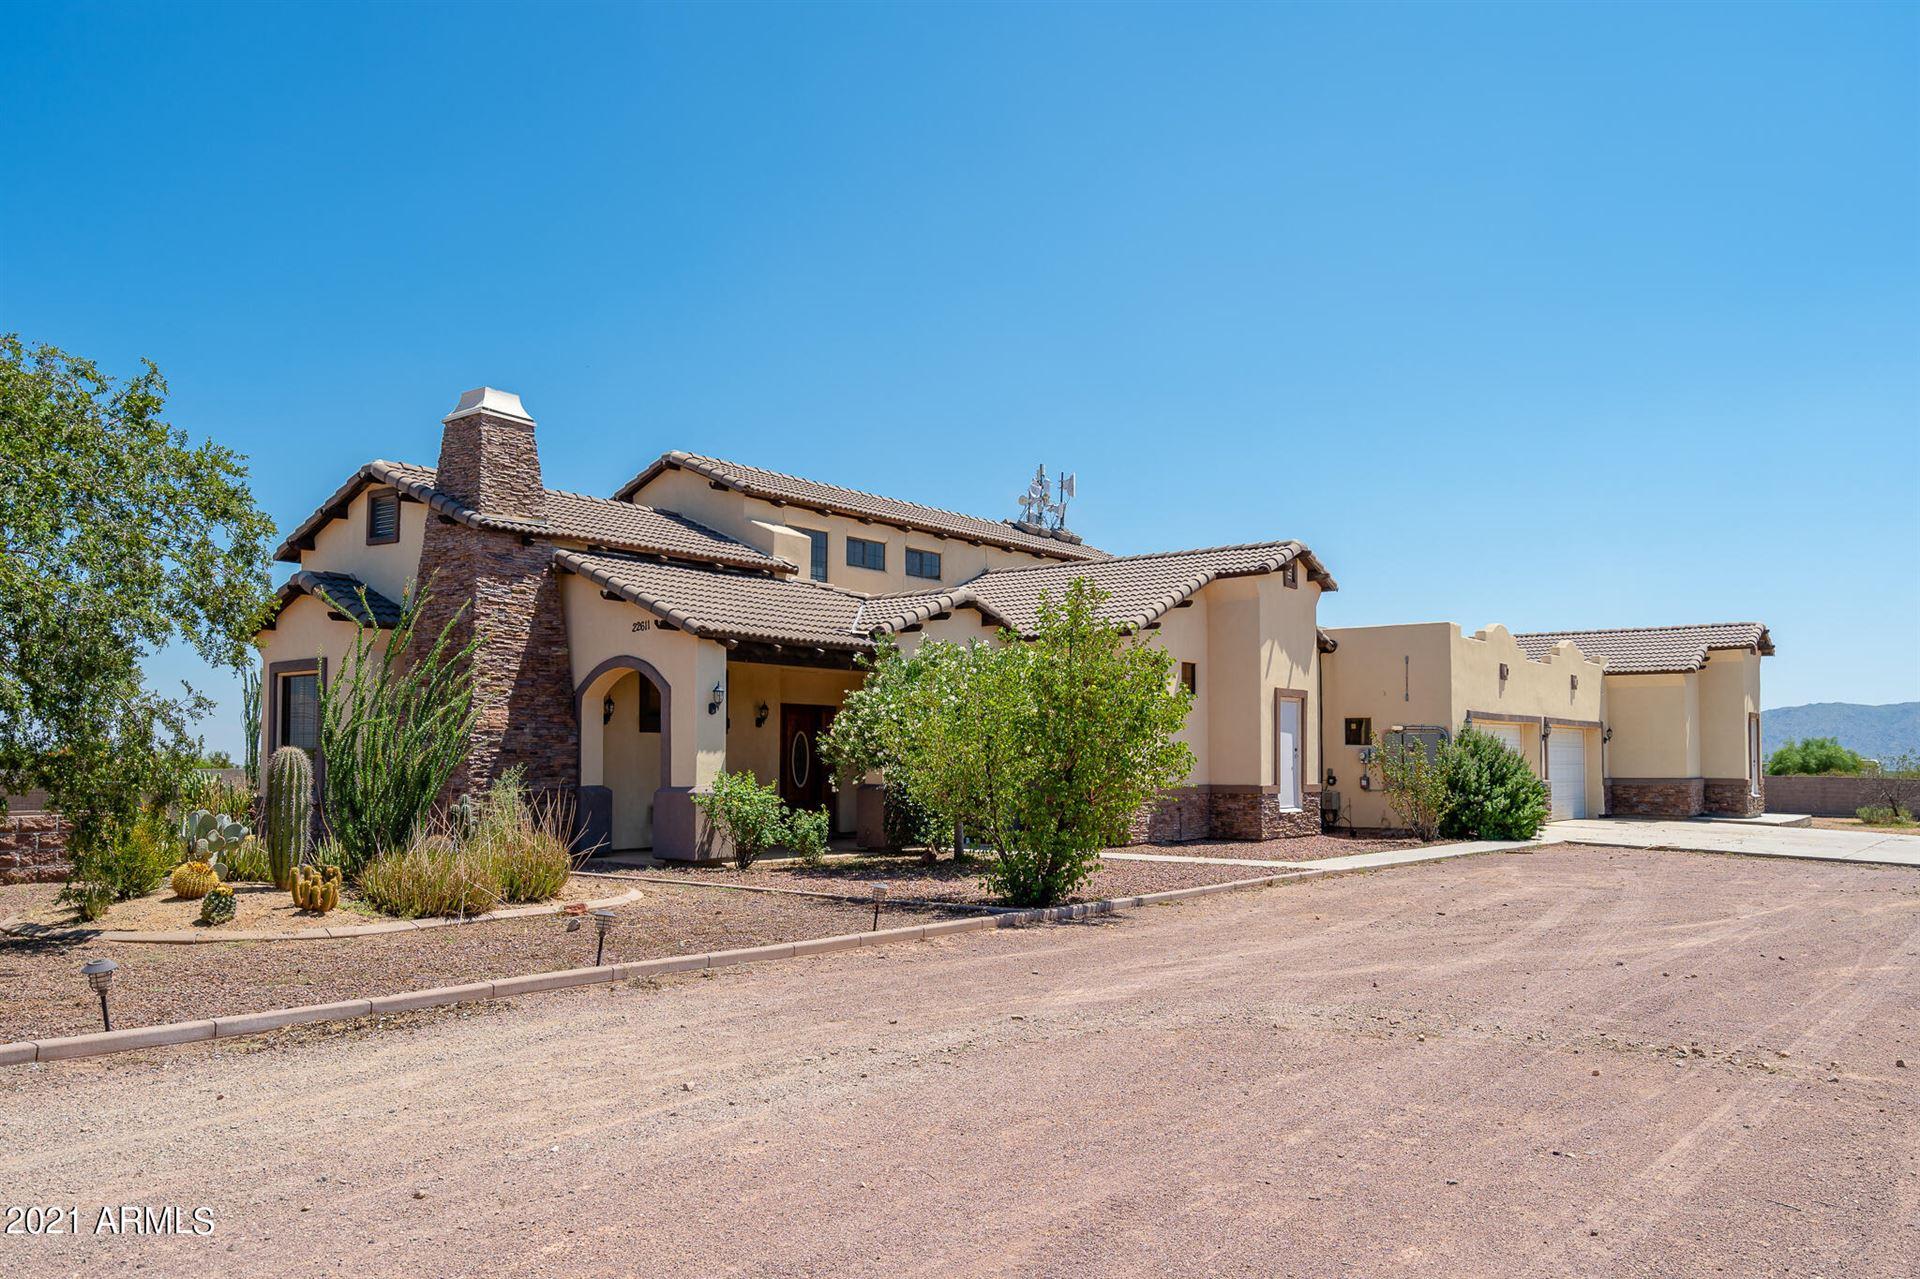 Photo of 22611 W PATTON Road, Wittmann, AZ 85361 (MLS # 6282733)